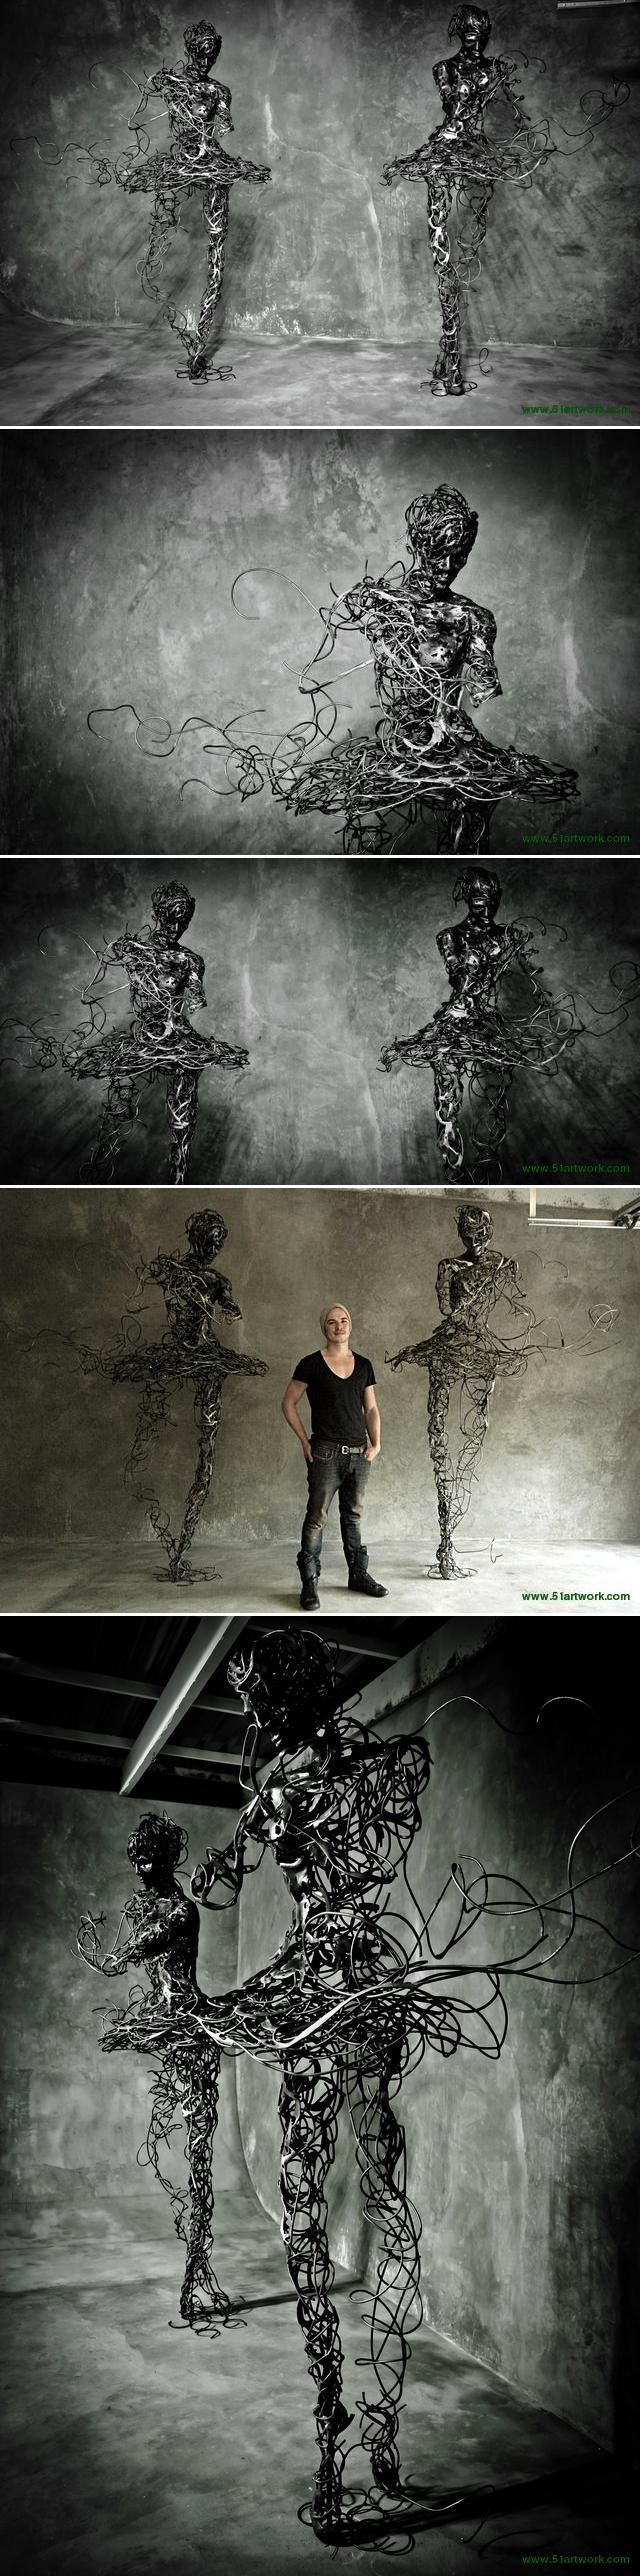 Artist Regardt van der Meulen created a series of sculptures that focused on the human body with its vulnerability and strength. http://en.51artwork.com/regardt-van-der-meulen-untitled/